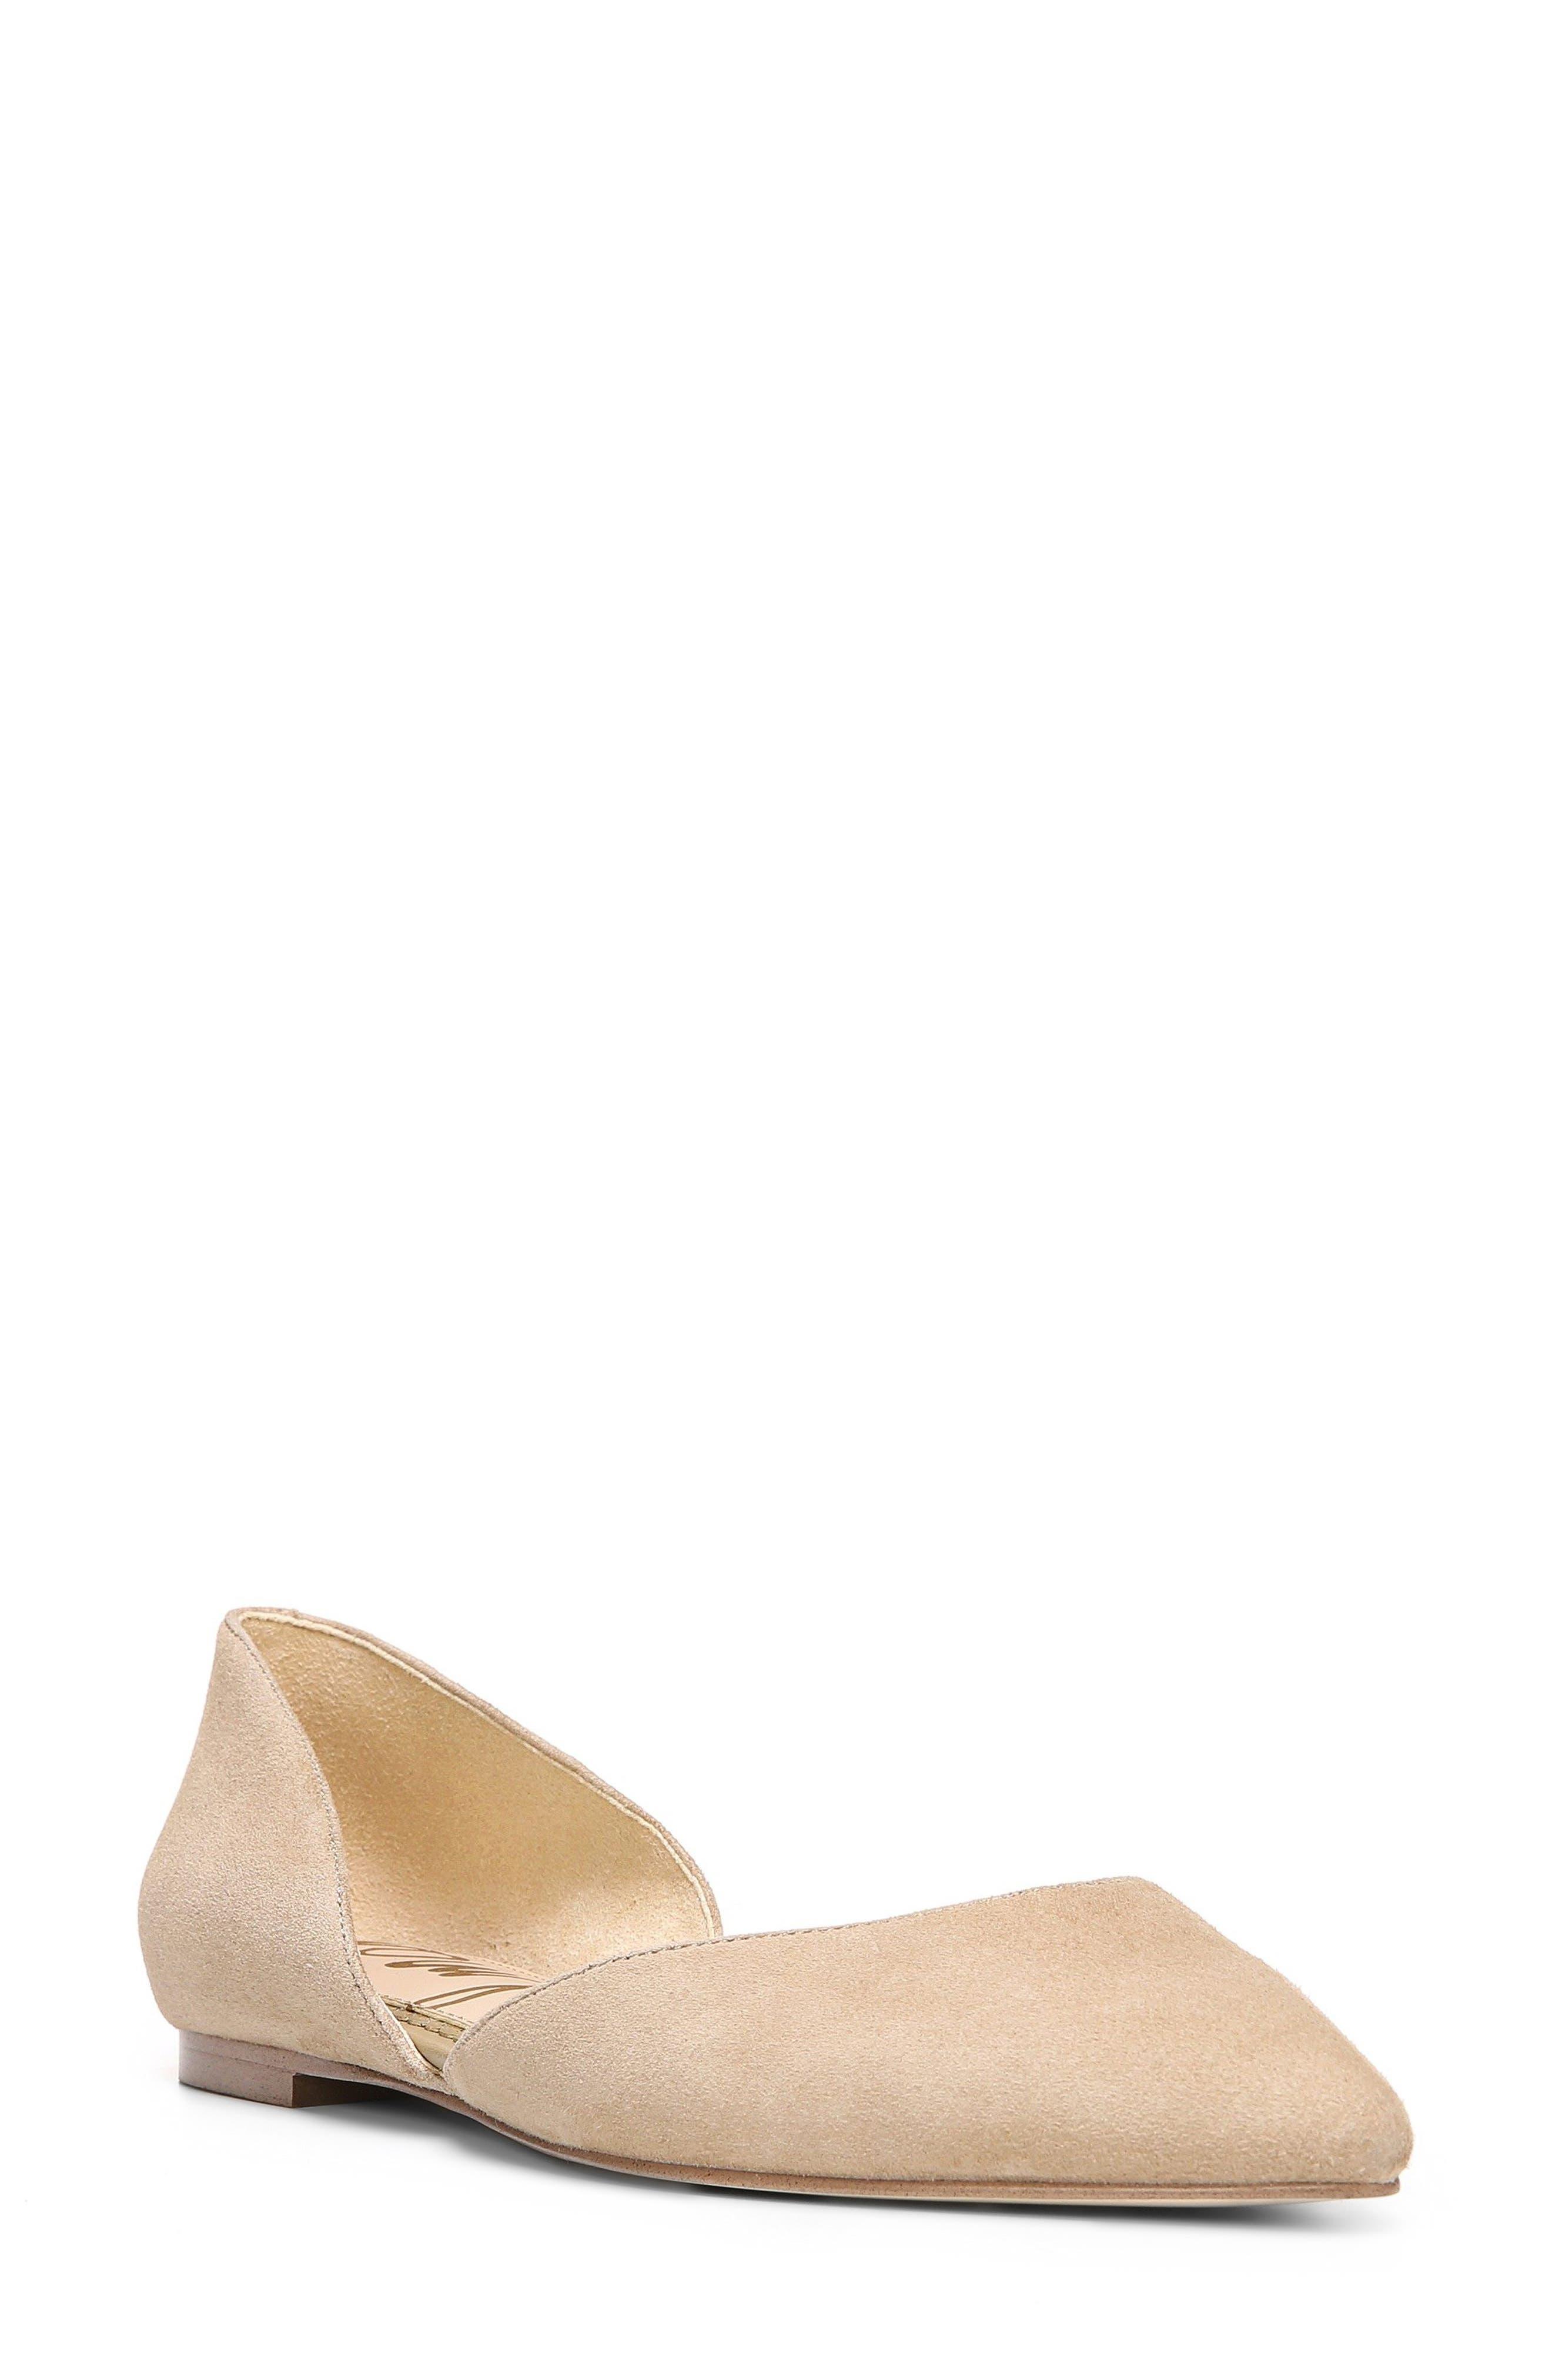 Alternate Image 1 Selected - Sam Edelman Rodney Pointy Toe d'Orsay Flat (Women)